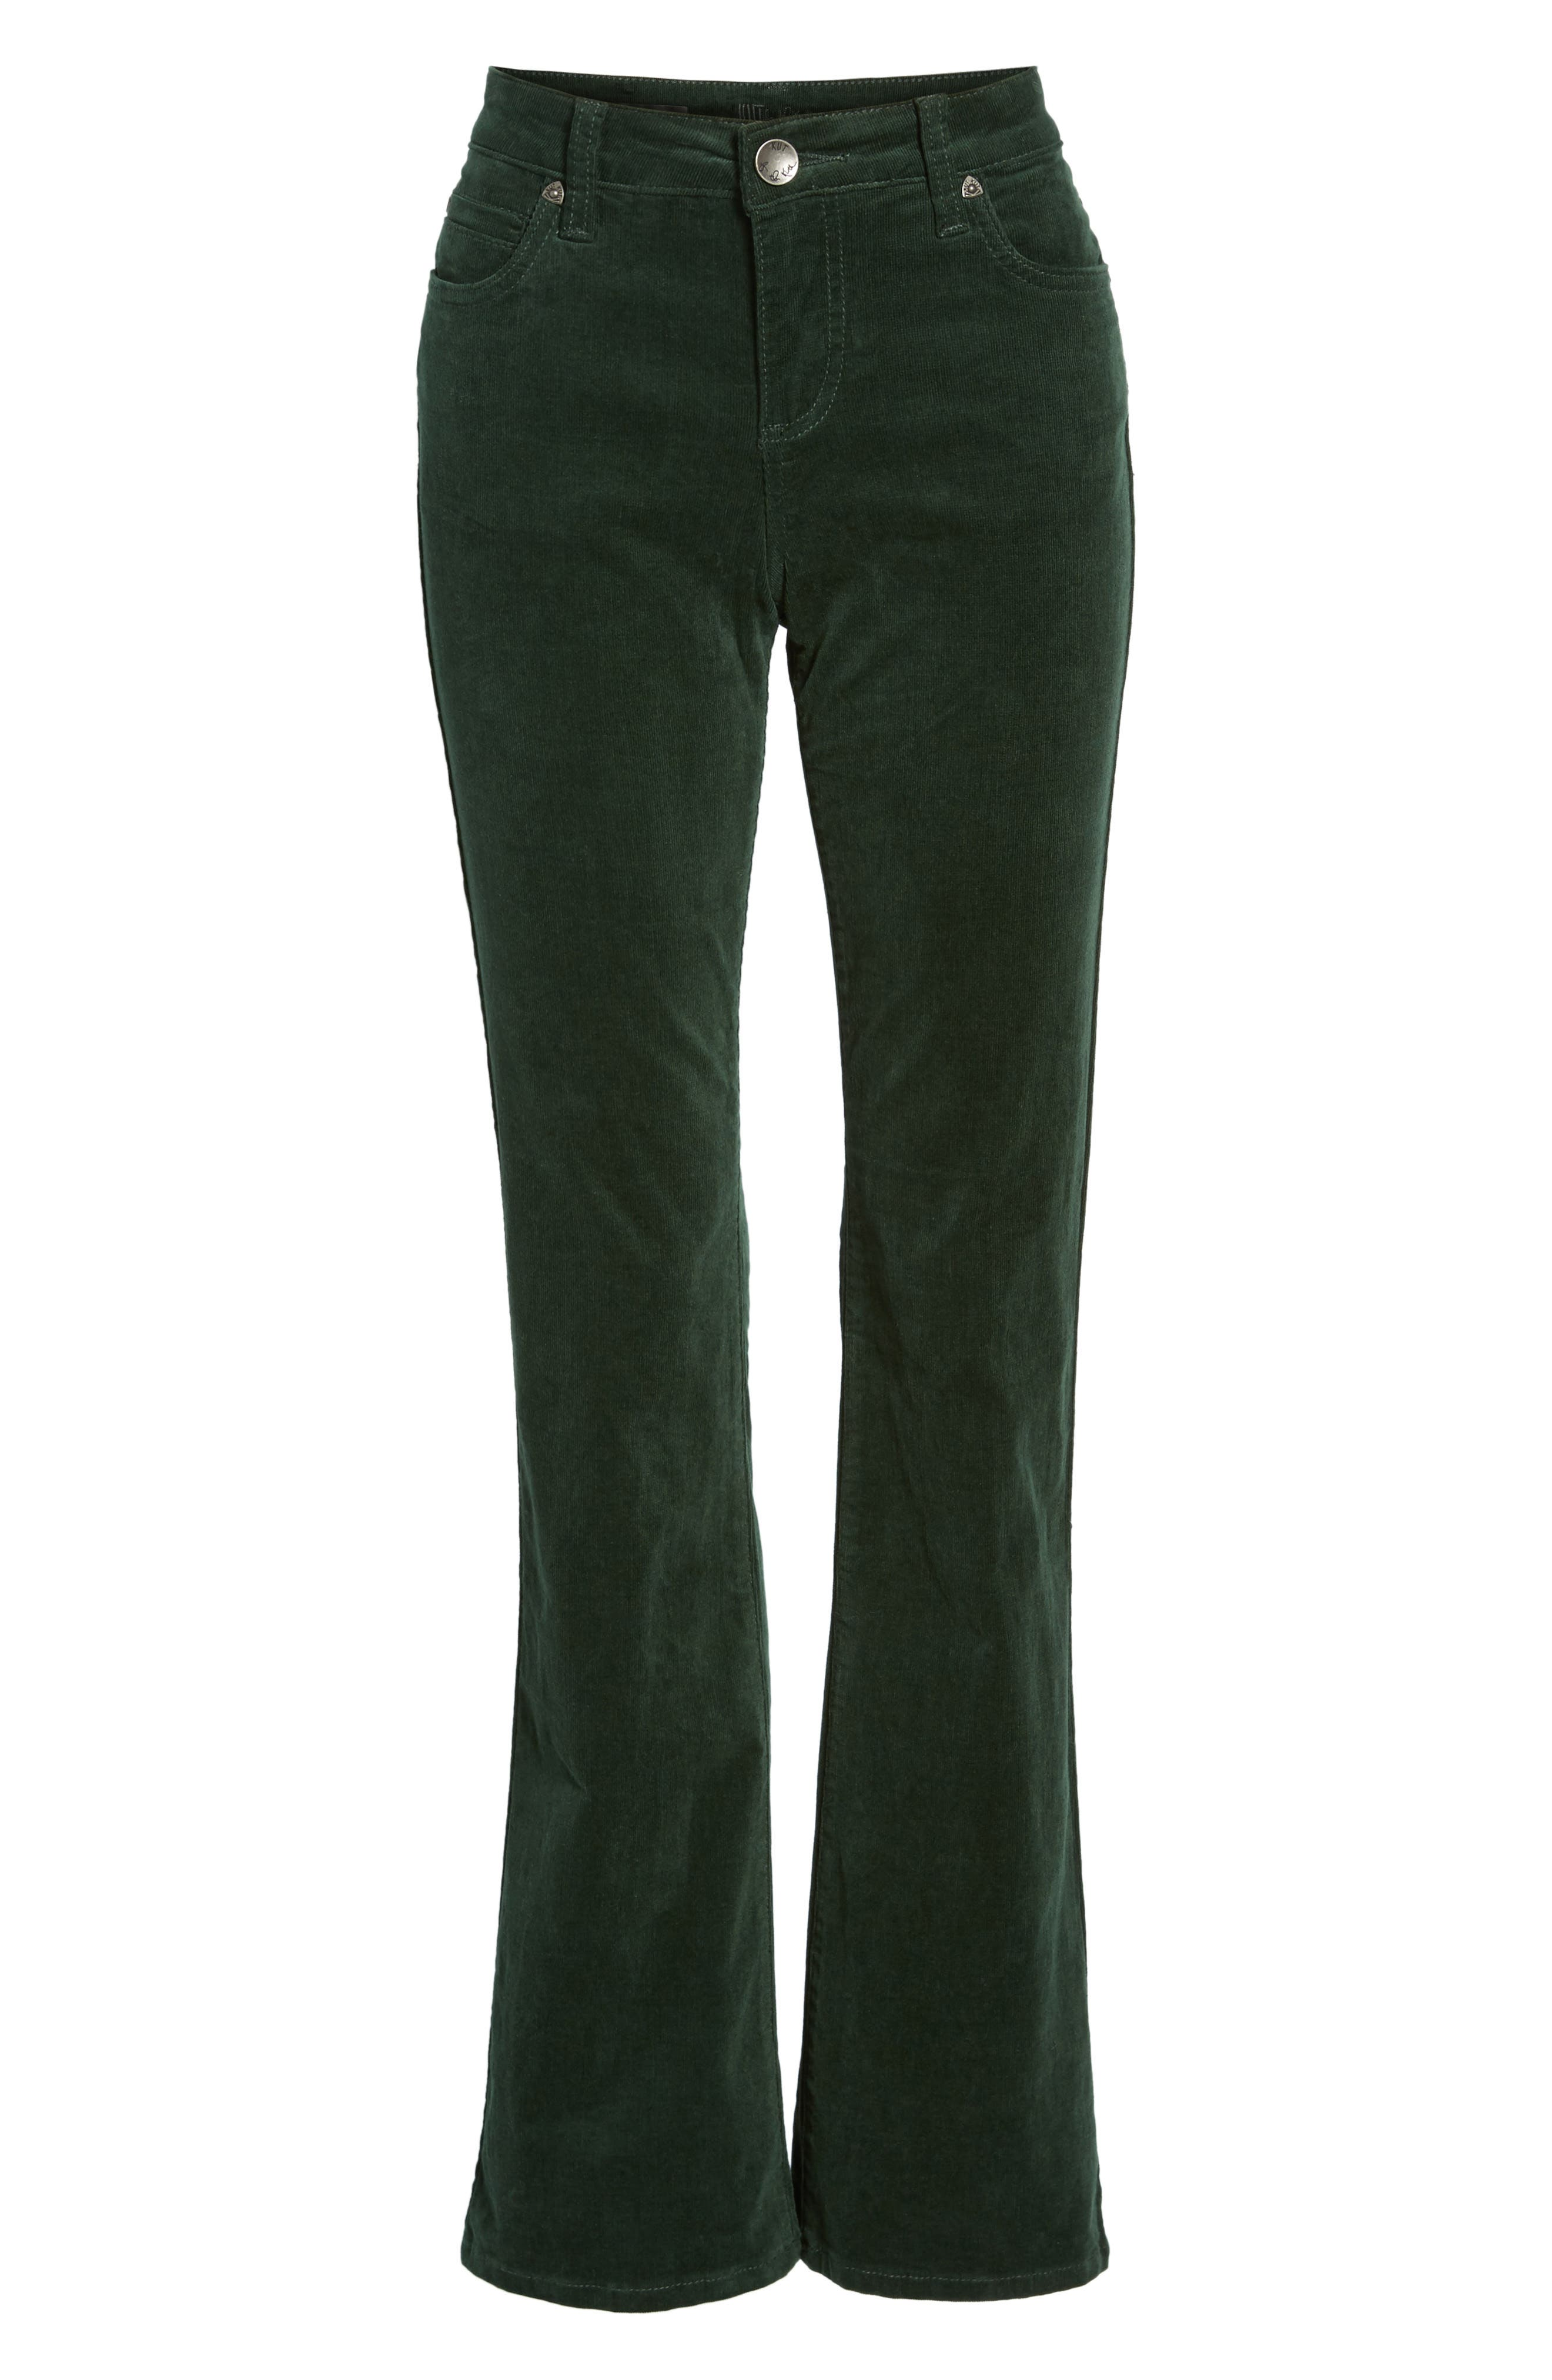 Womens Green Corduroy Pants 0BsKXAyF